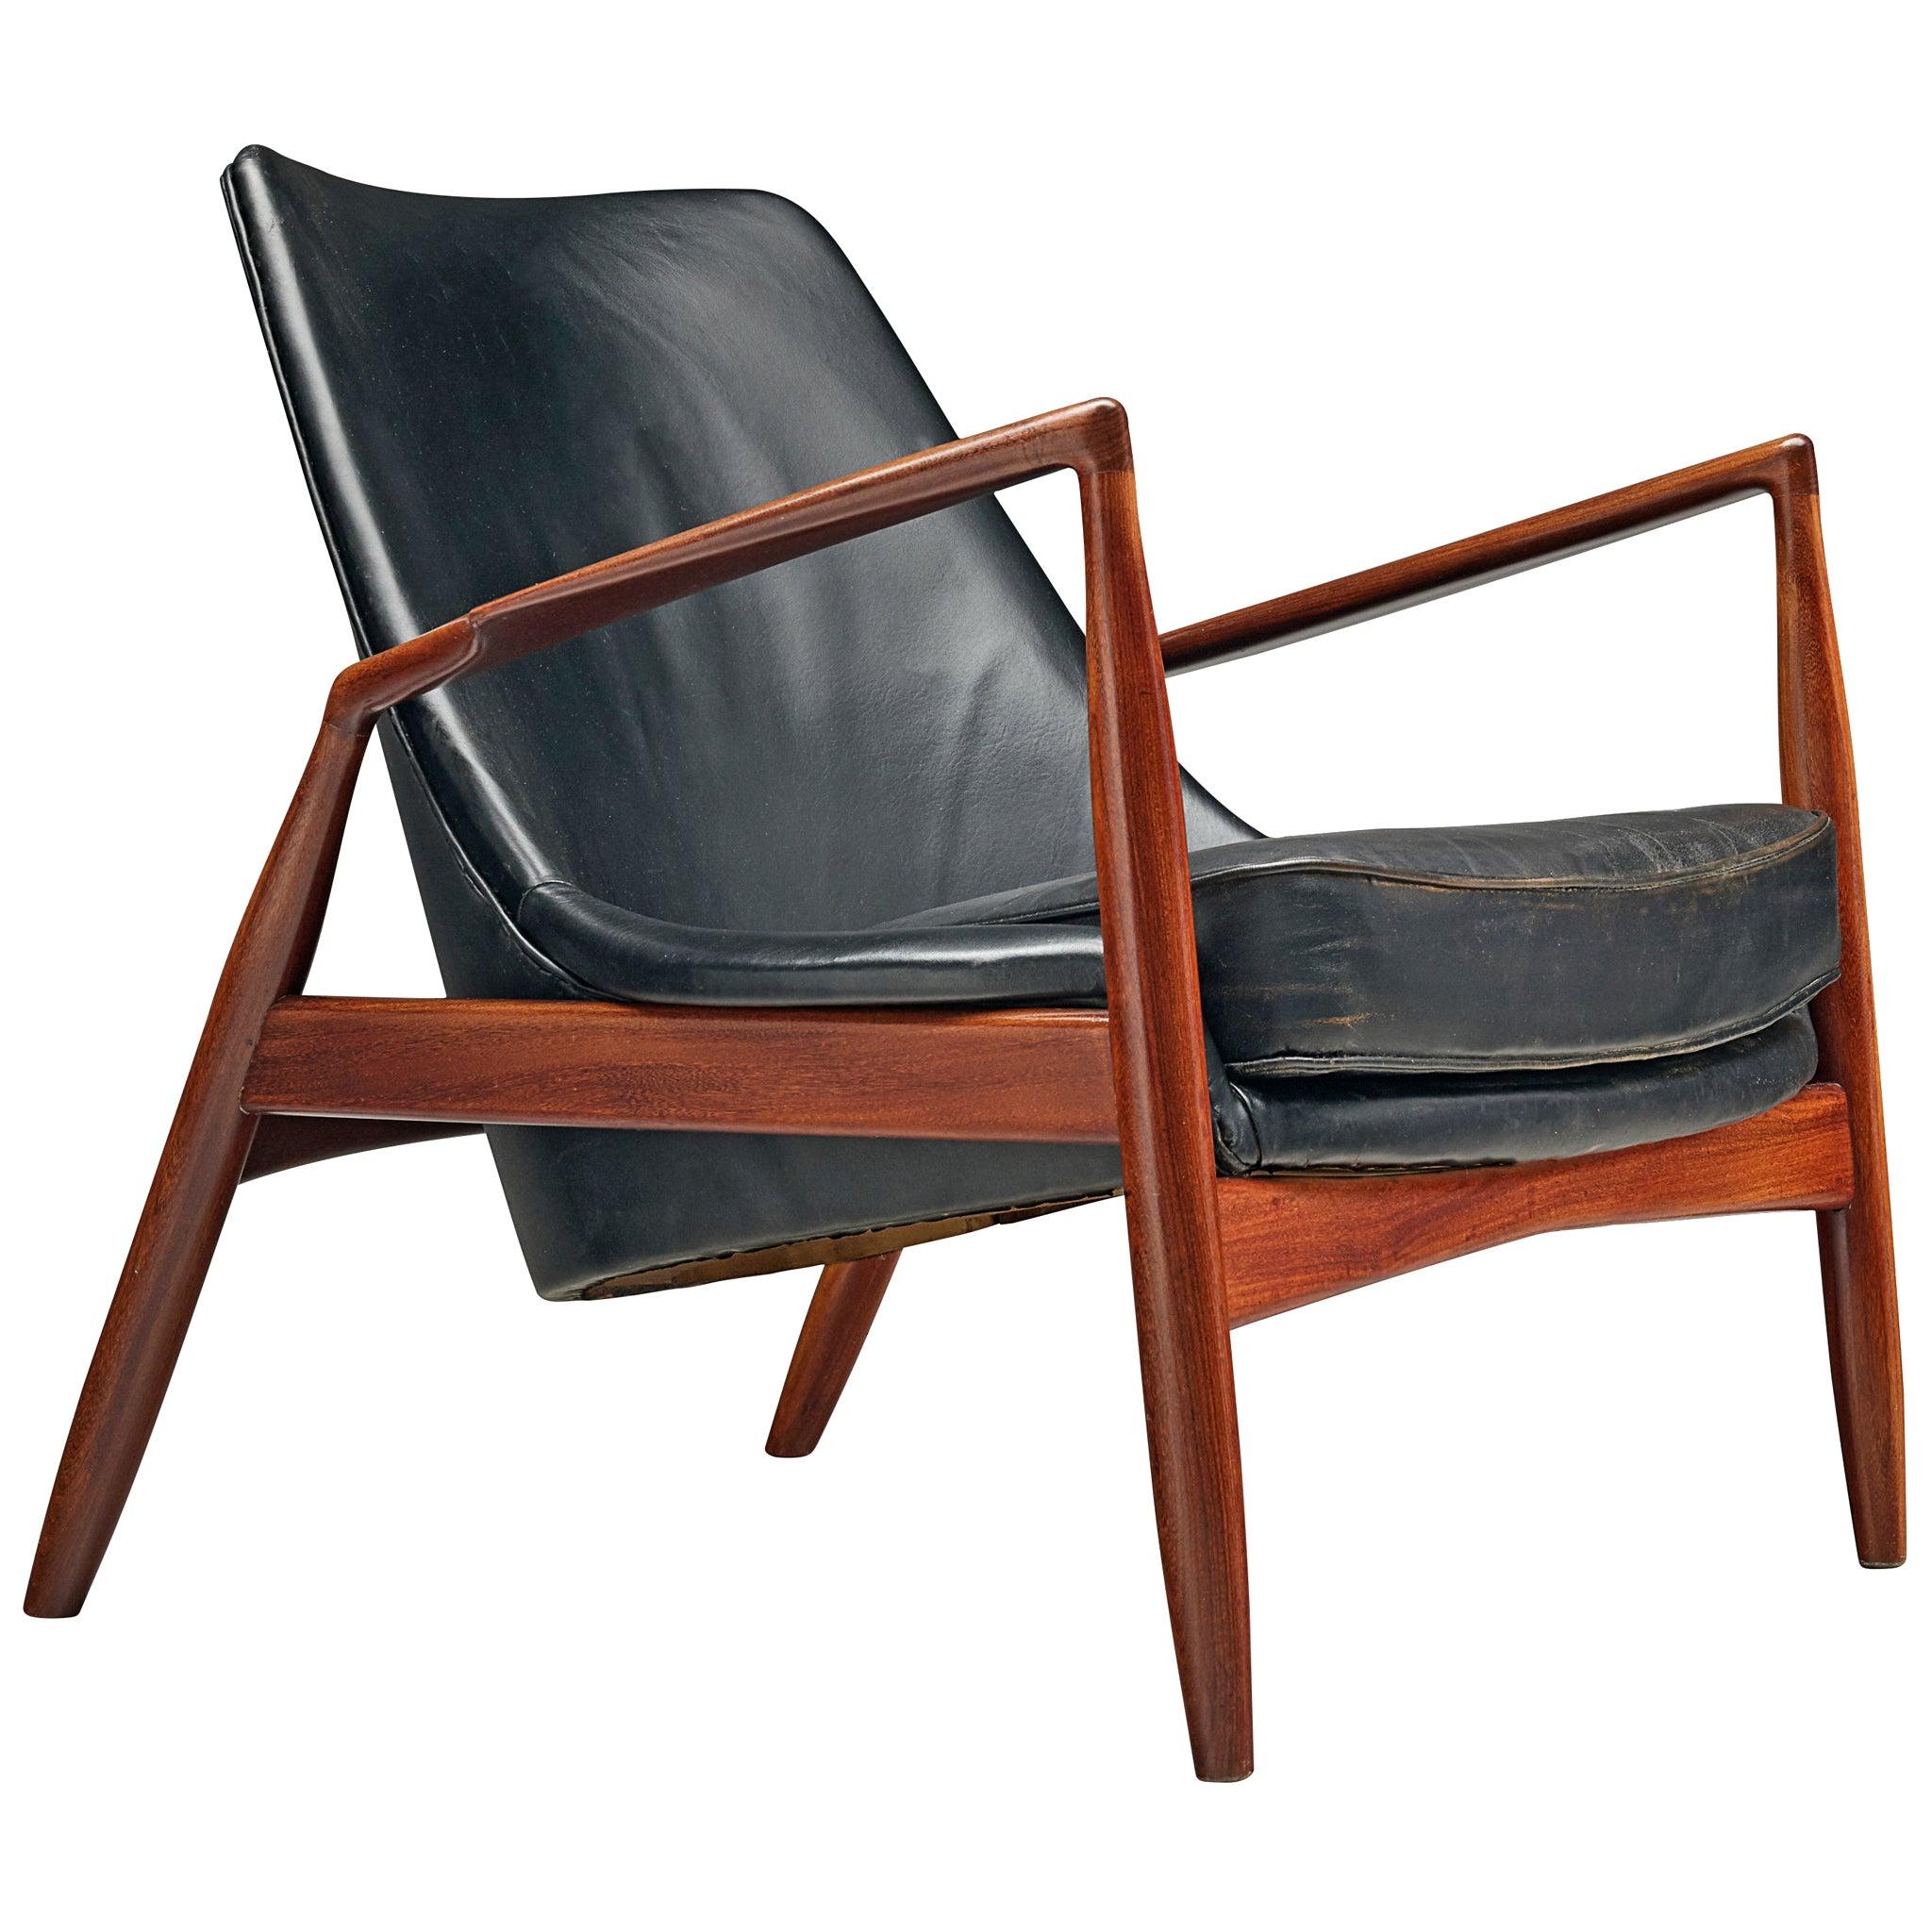 Restored Ib Kofod-Larsen Black Leather Seal Chair